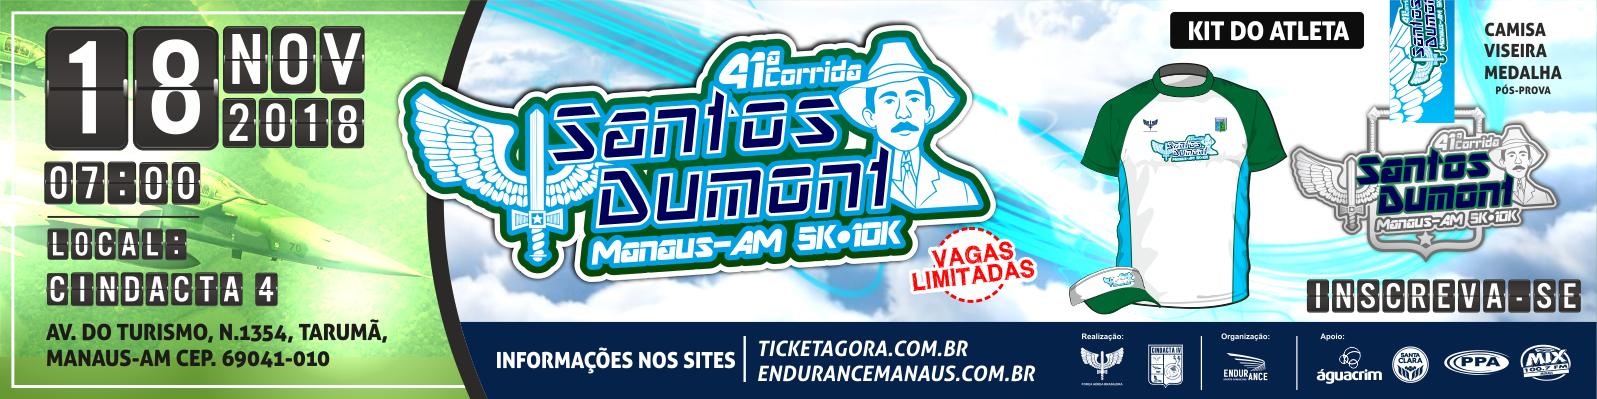 41ª CORRIDA SANTOS DUMONT - 2018  - Imagem de topo